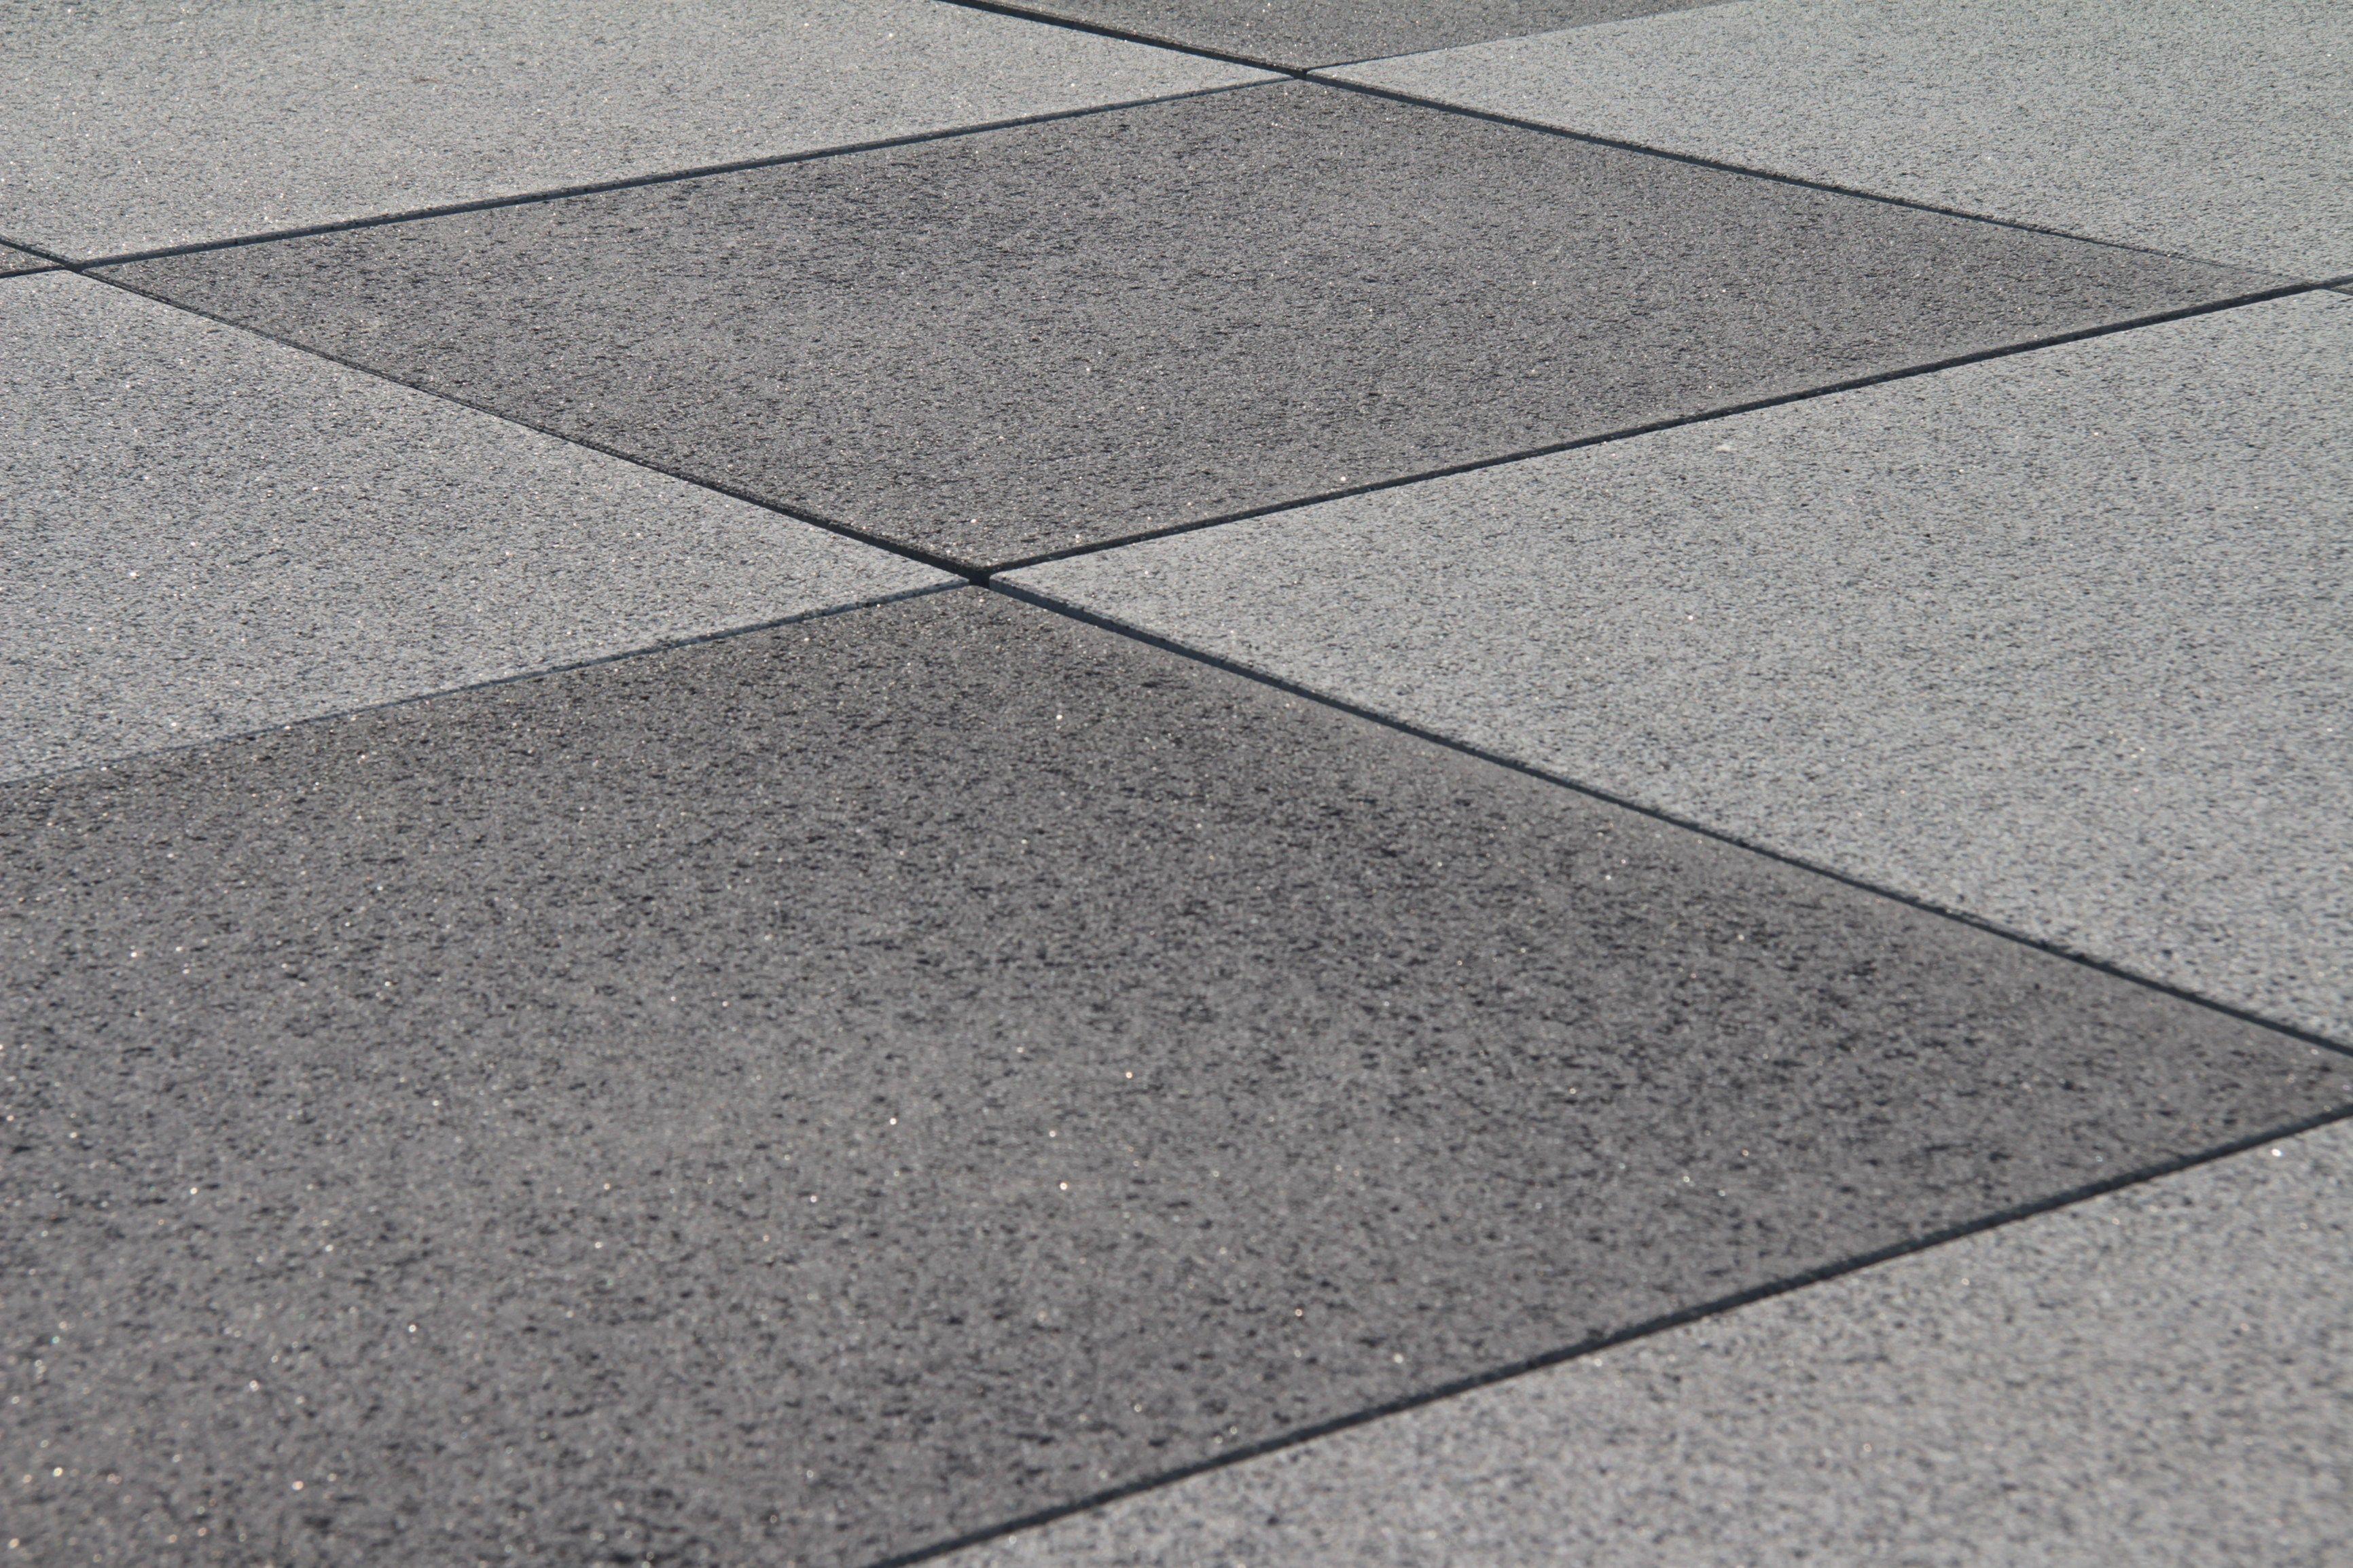 Asphalt floor tile